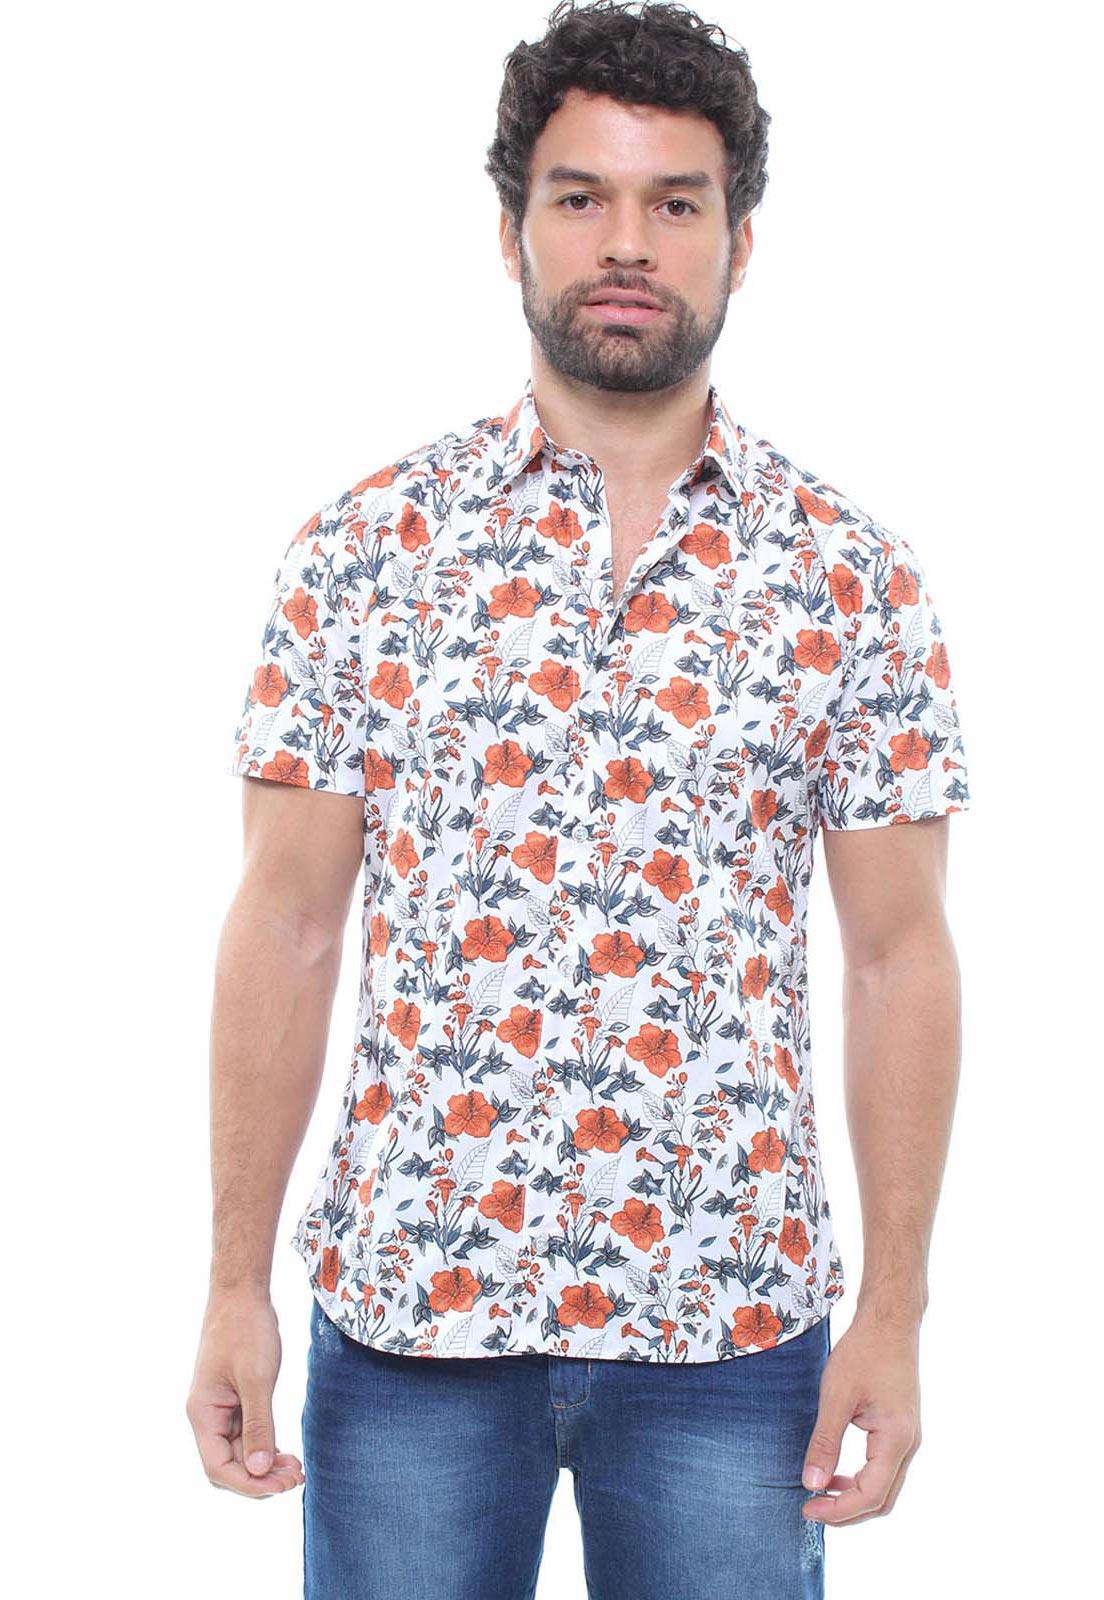 Camisa Estampada Masculina Manga Curta Crocker -  47934